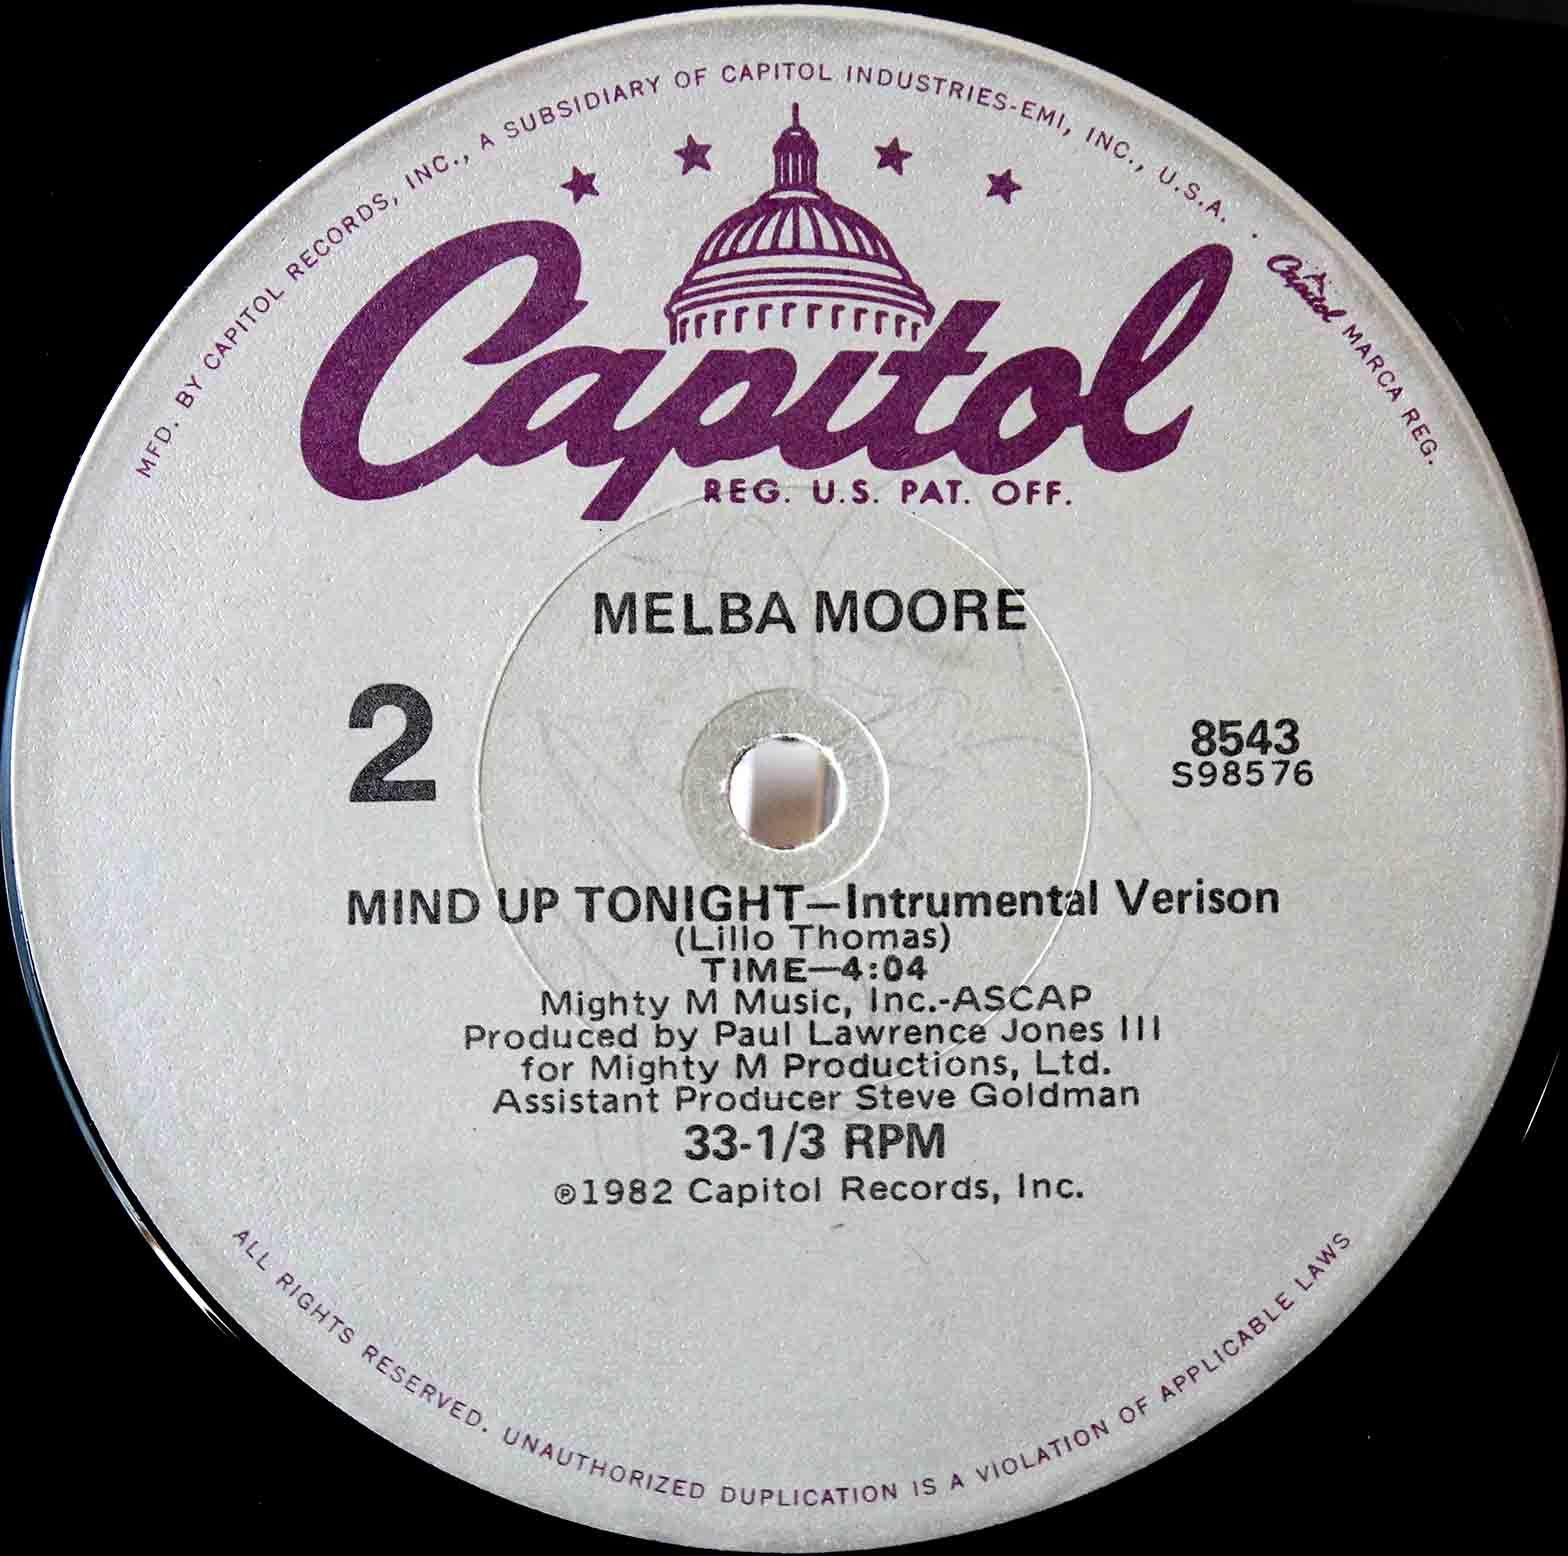 Melba Moore - Mind Up Tonight 04